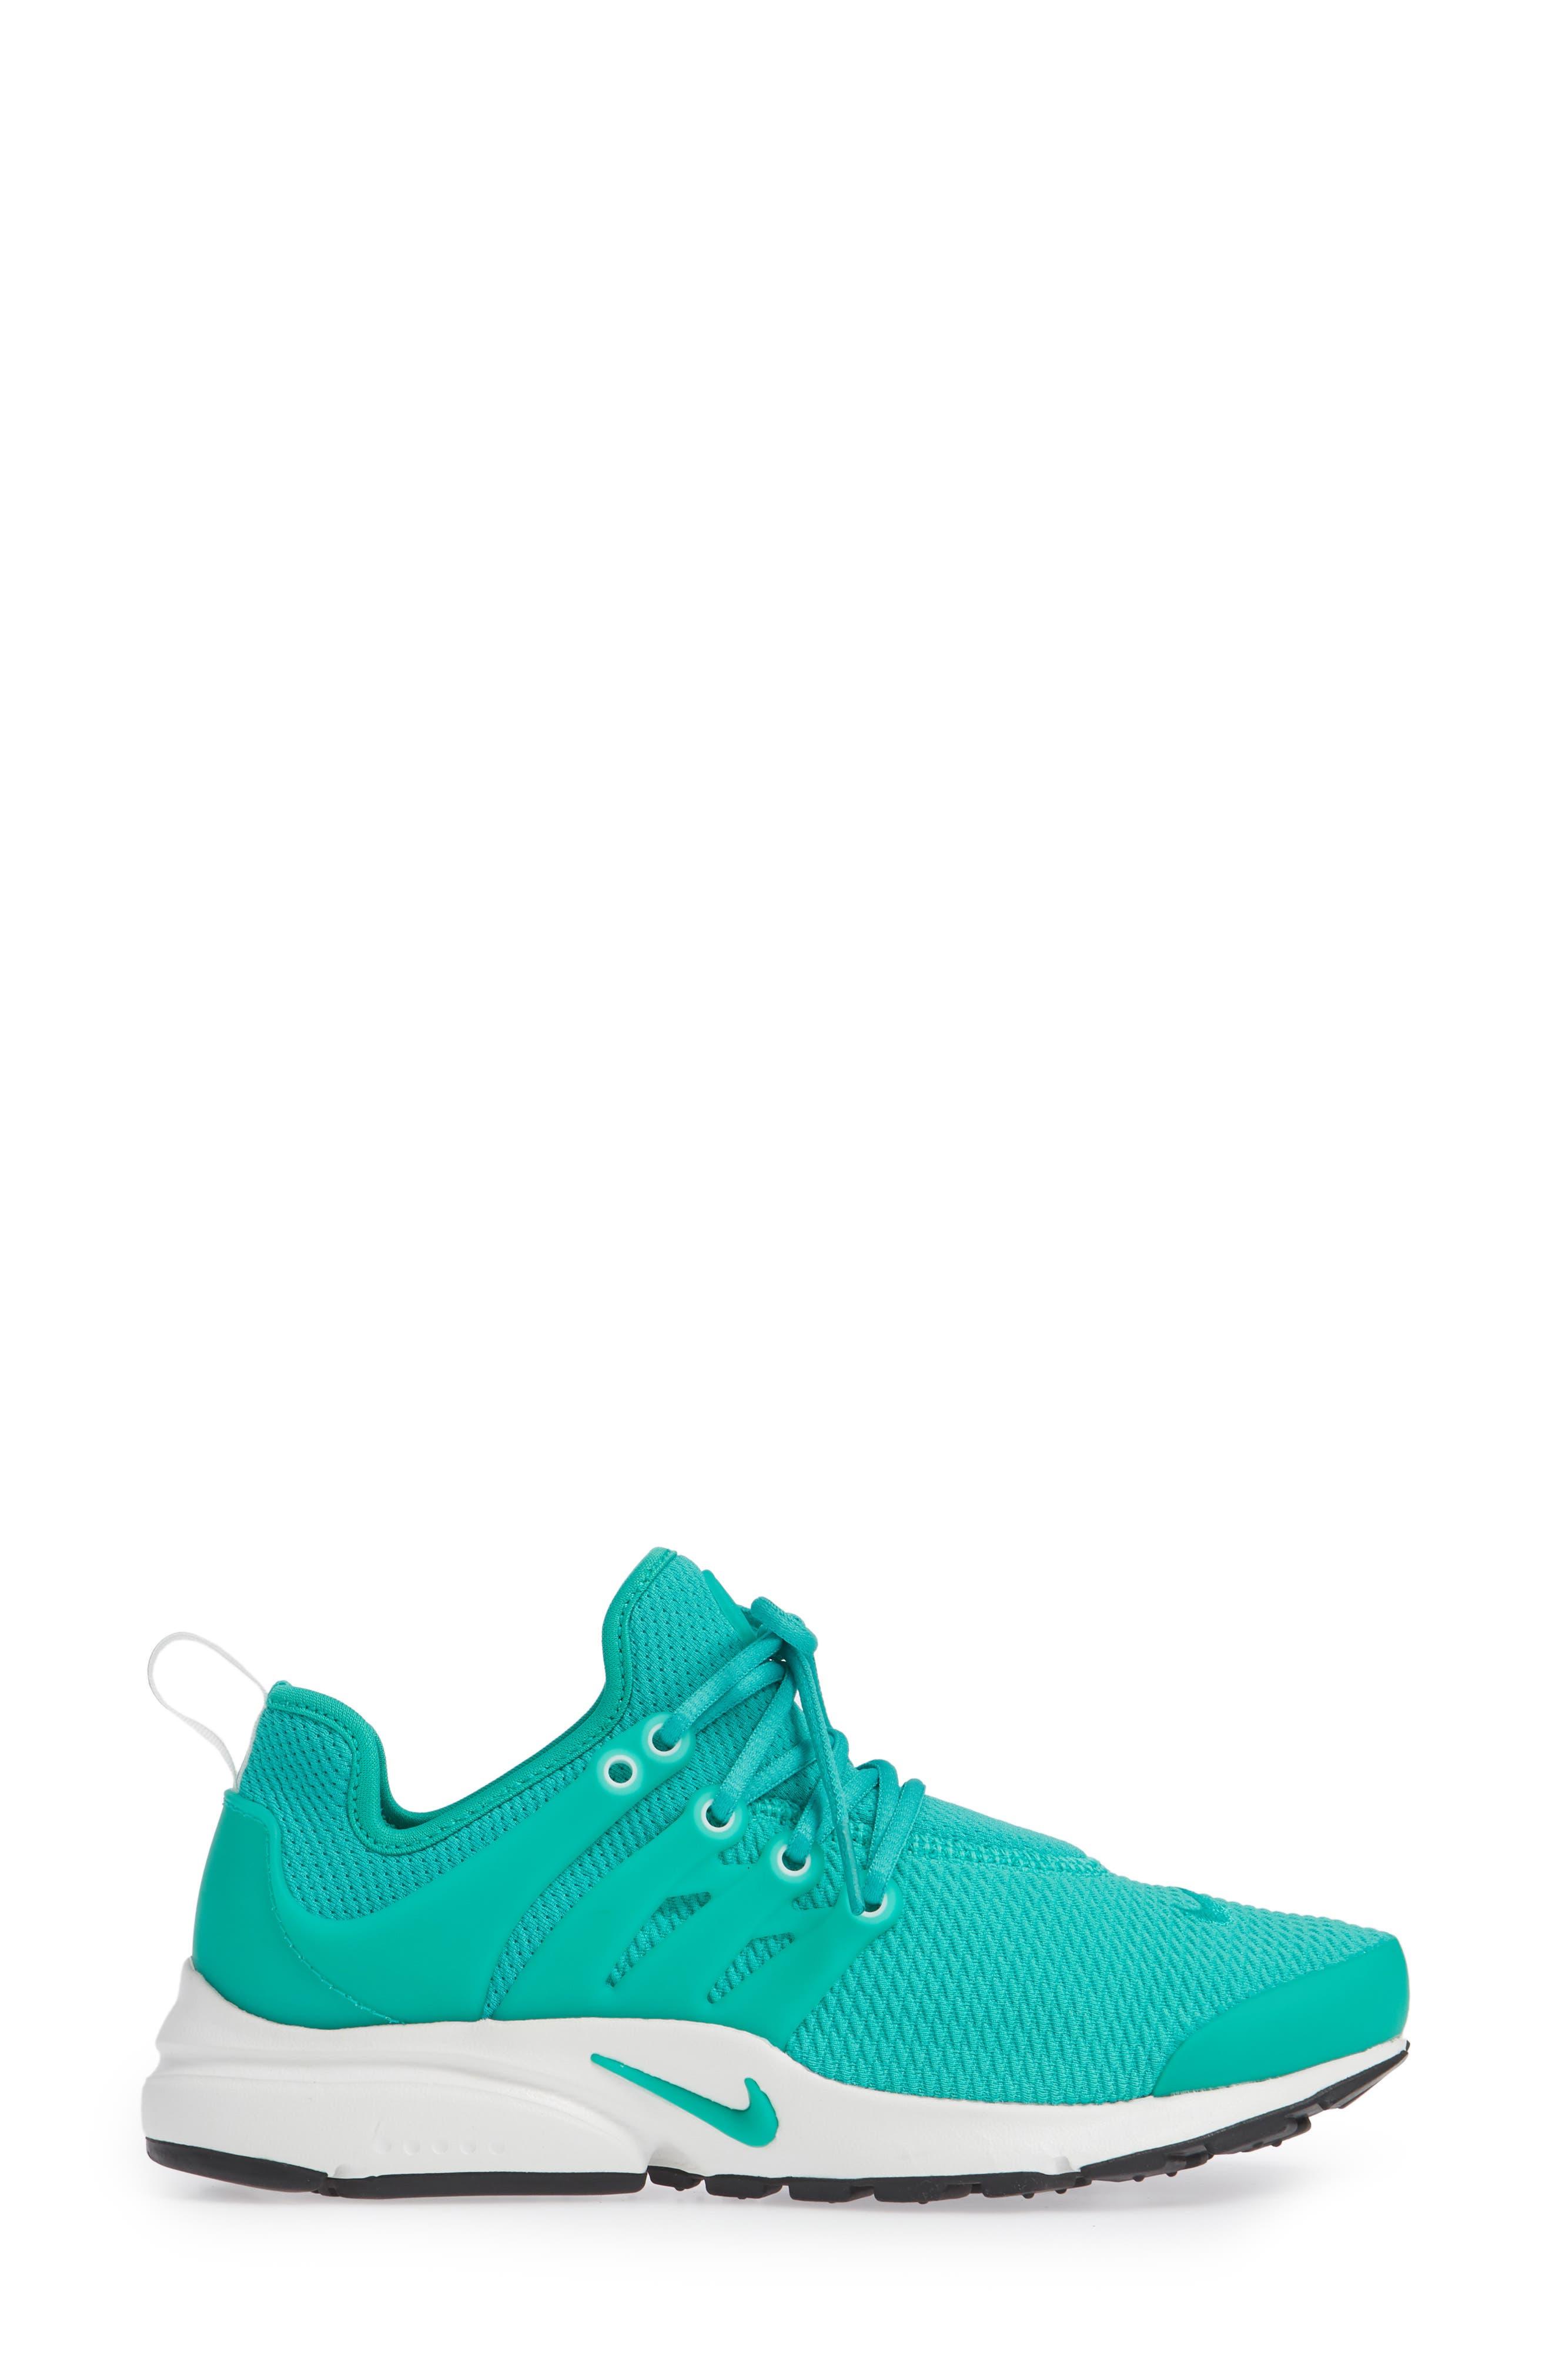 Air Presto Sneaker,                             Alternate thumbnail 5, color,                             Clear Emerald/ Summit White